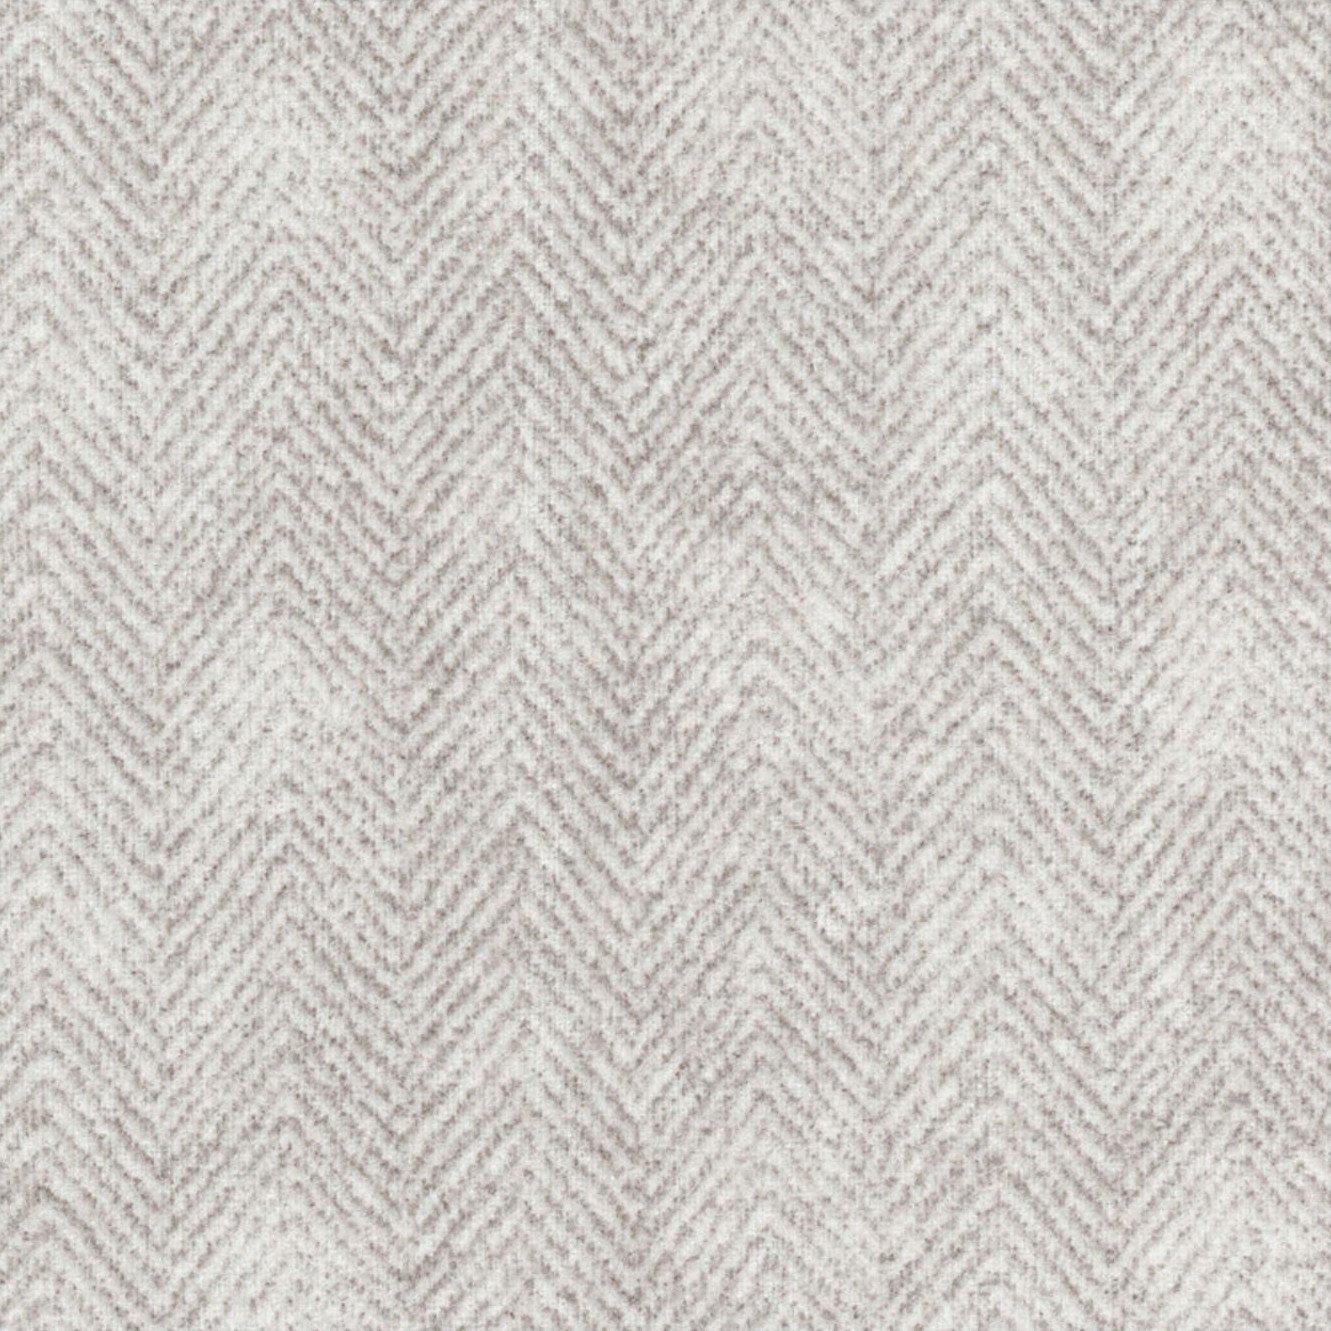 Woolies Flannel Herringbone Light Gray (MASF1841-K2)